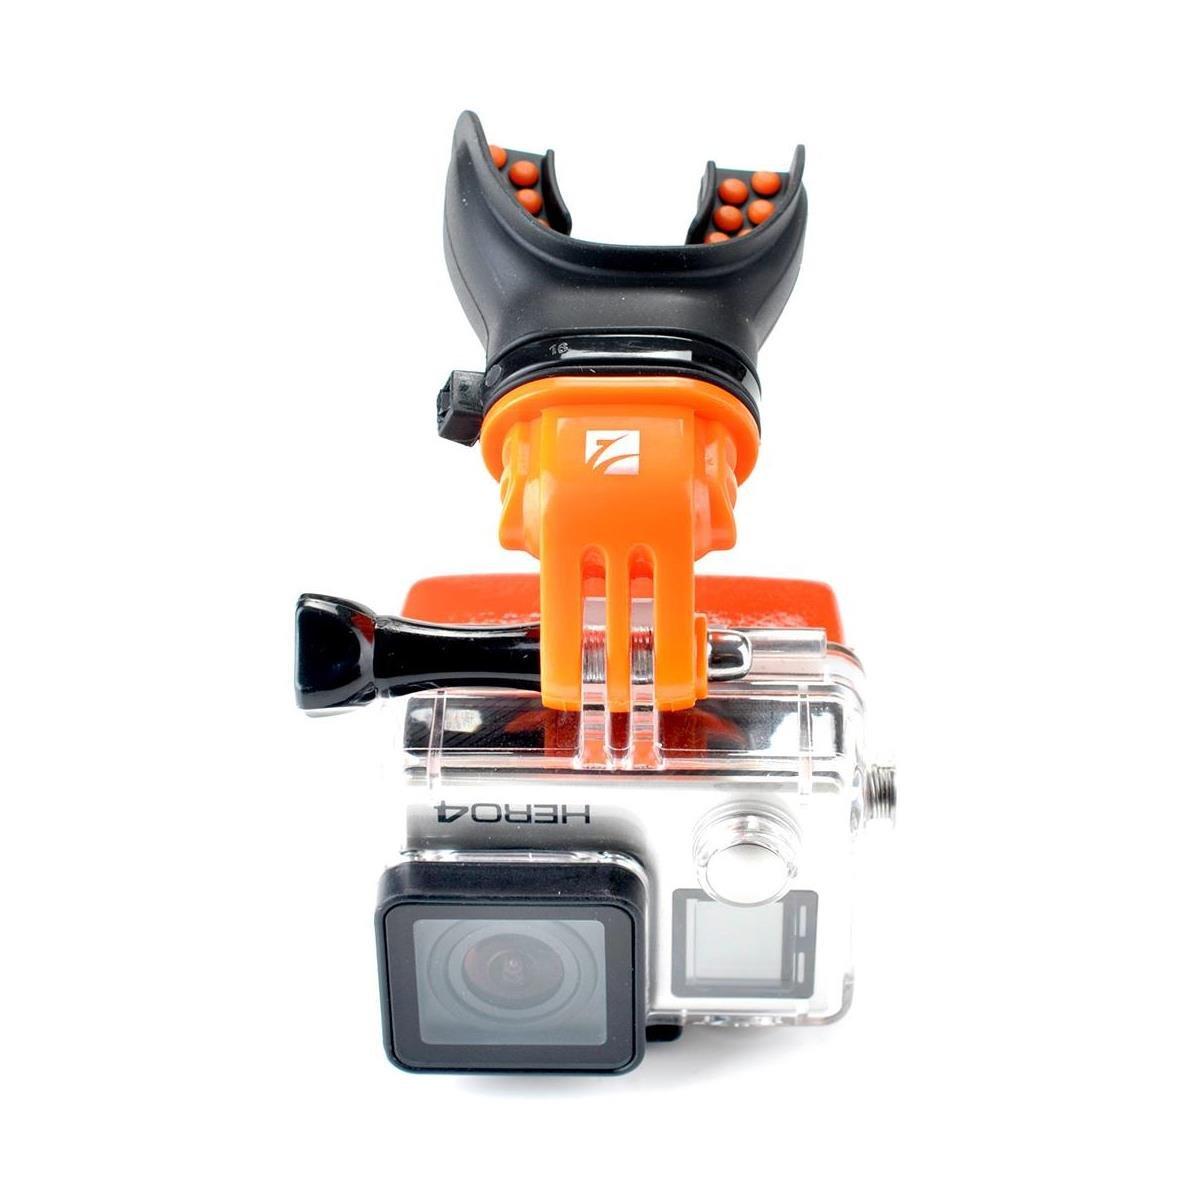 Freewell Mouth for GoPro Camera, Orange